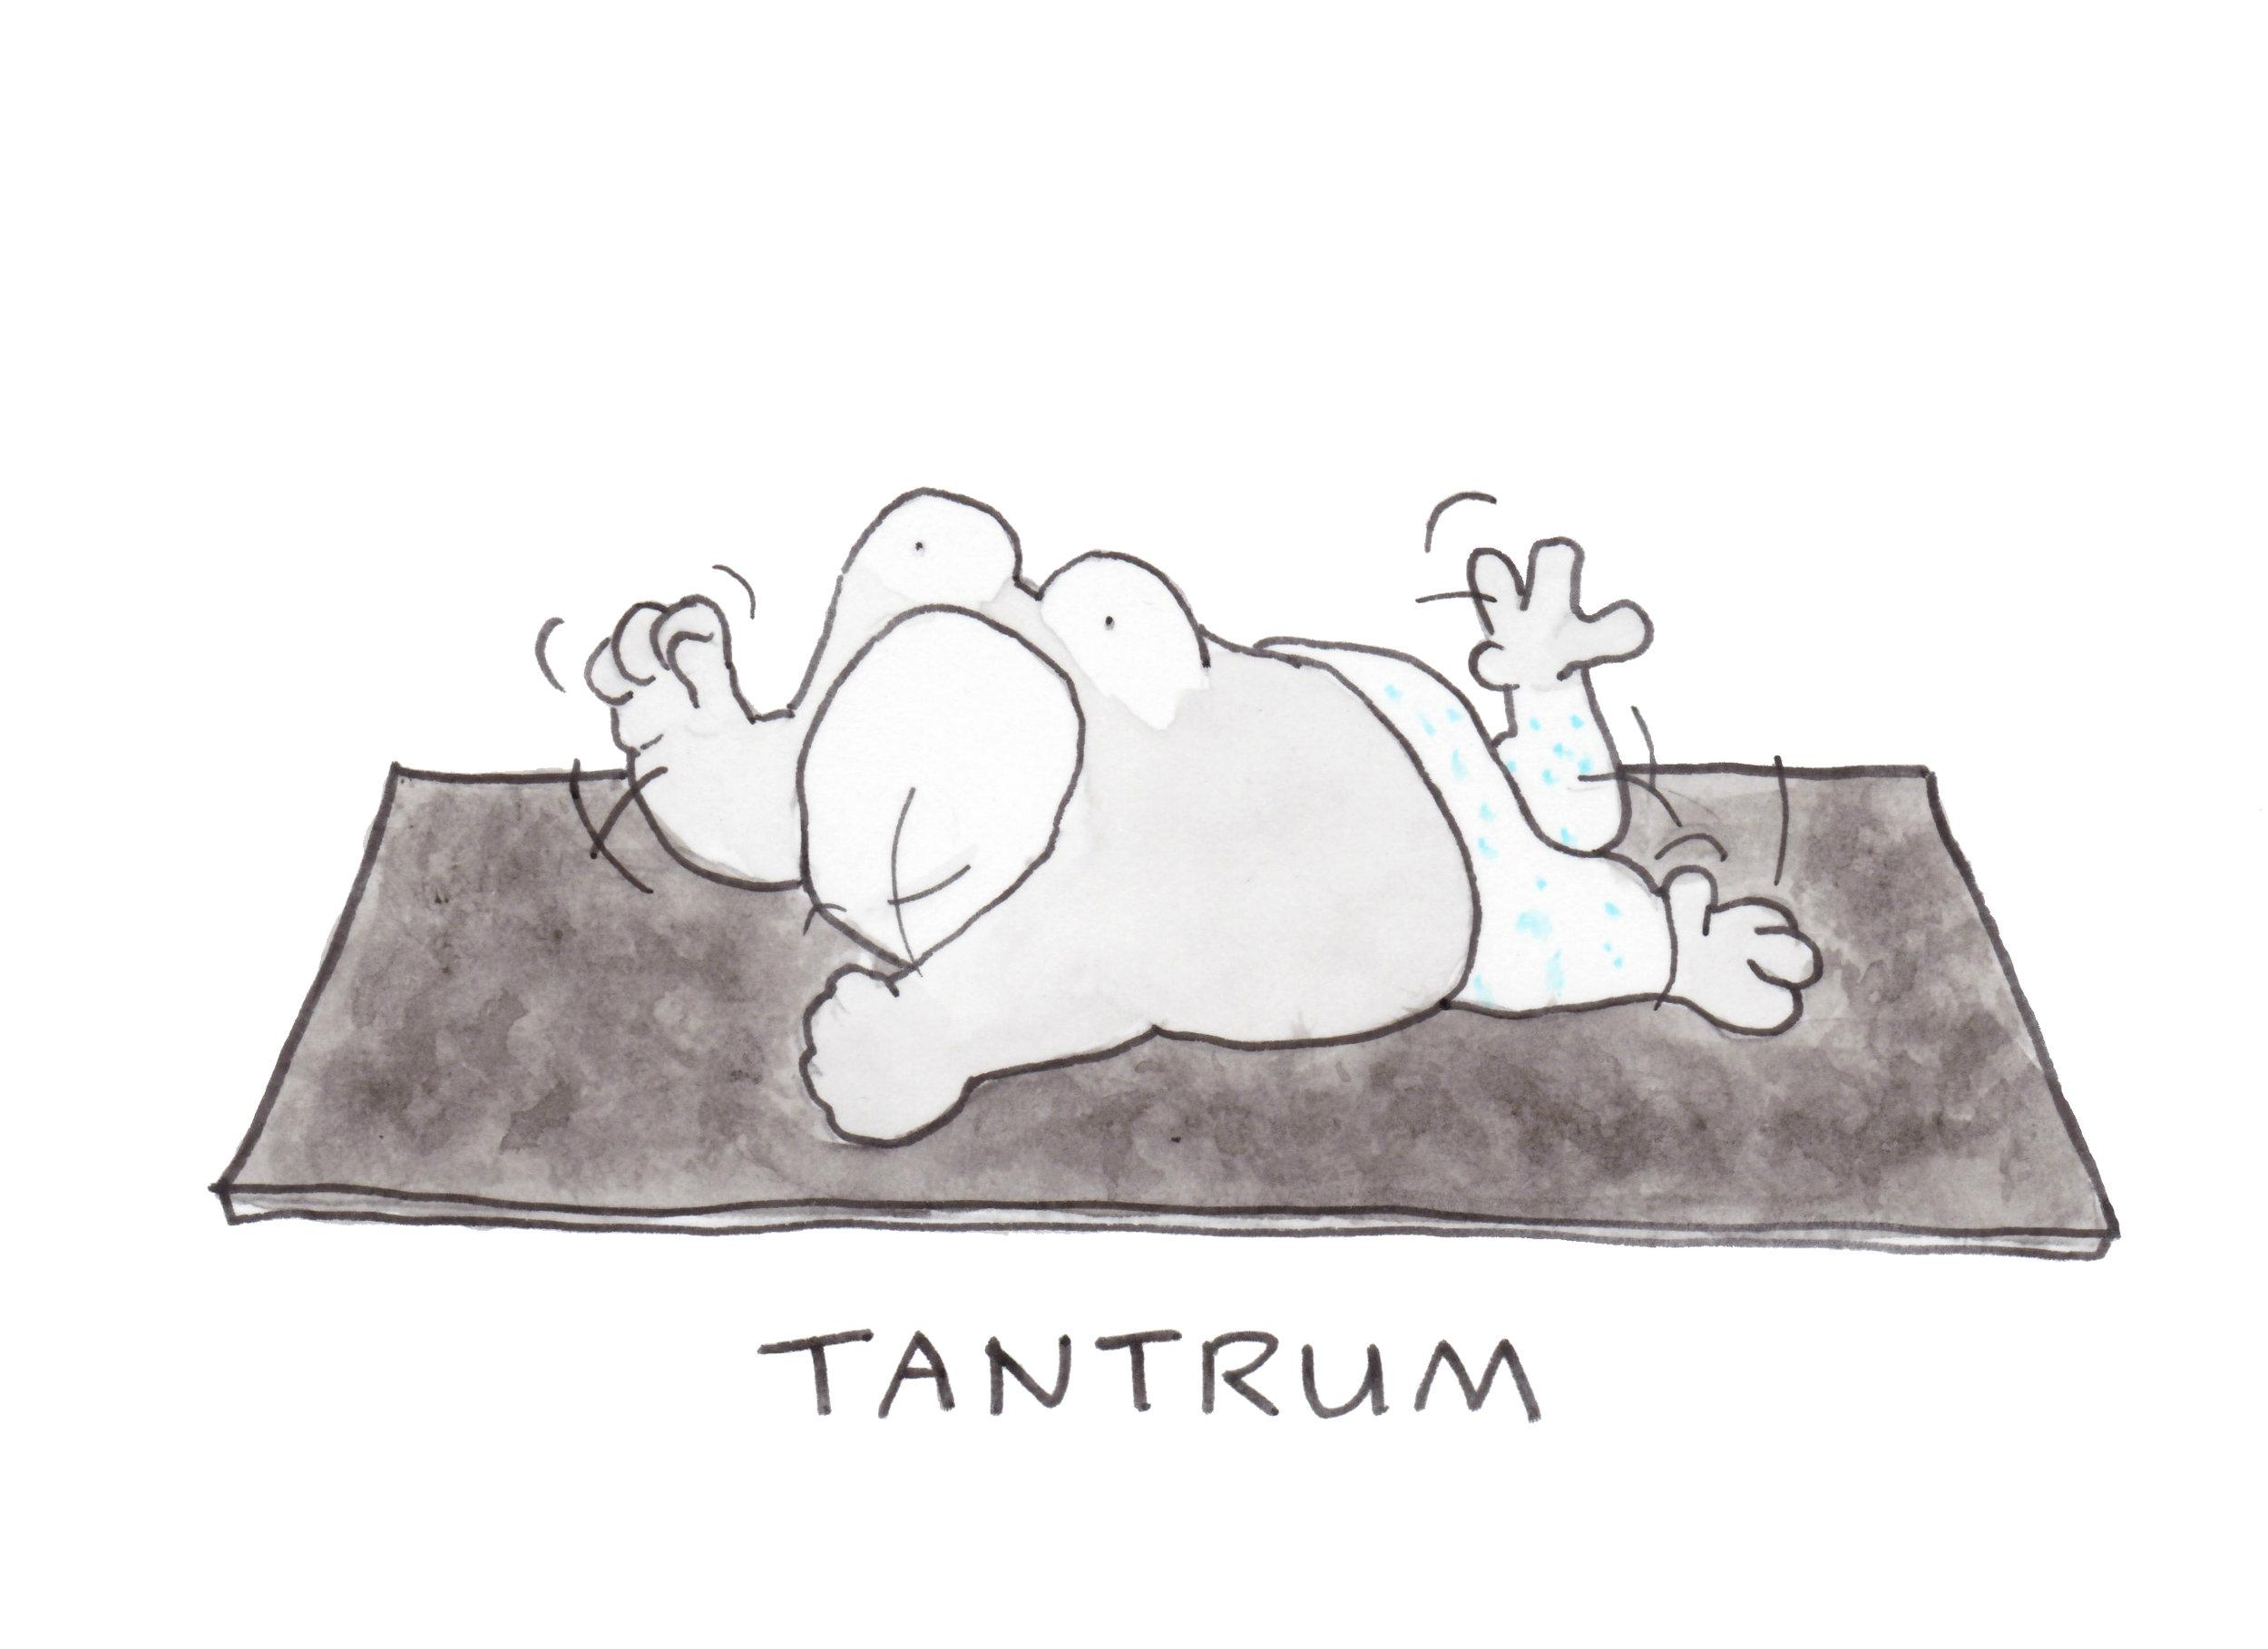 7-Tantrum 1.jpg